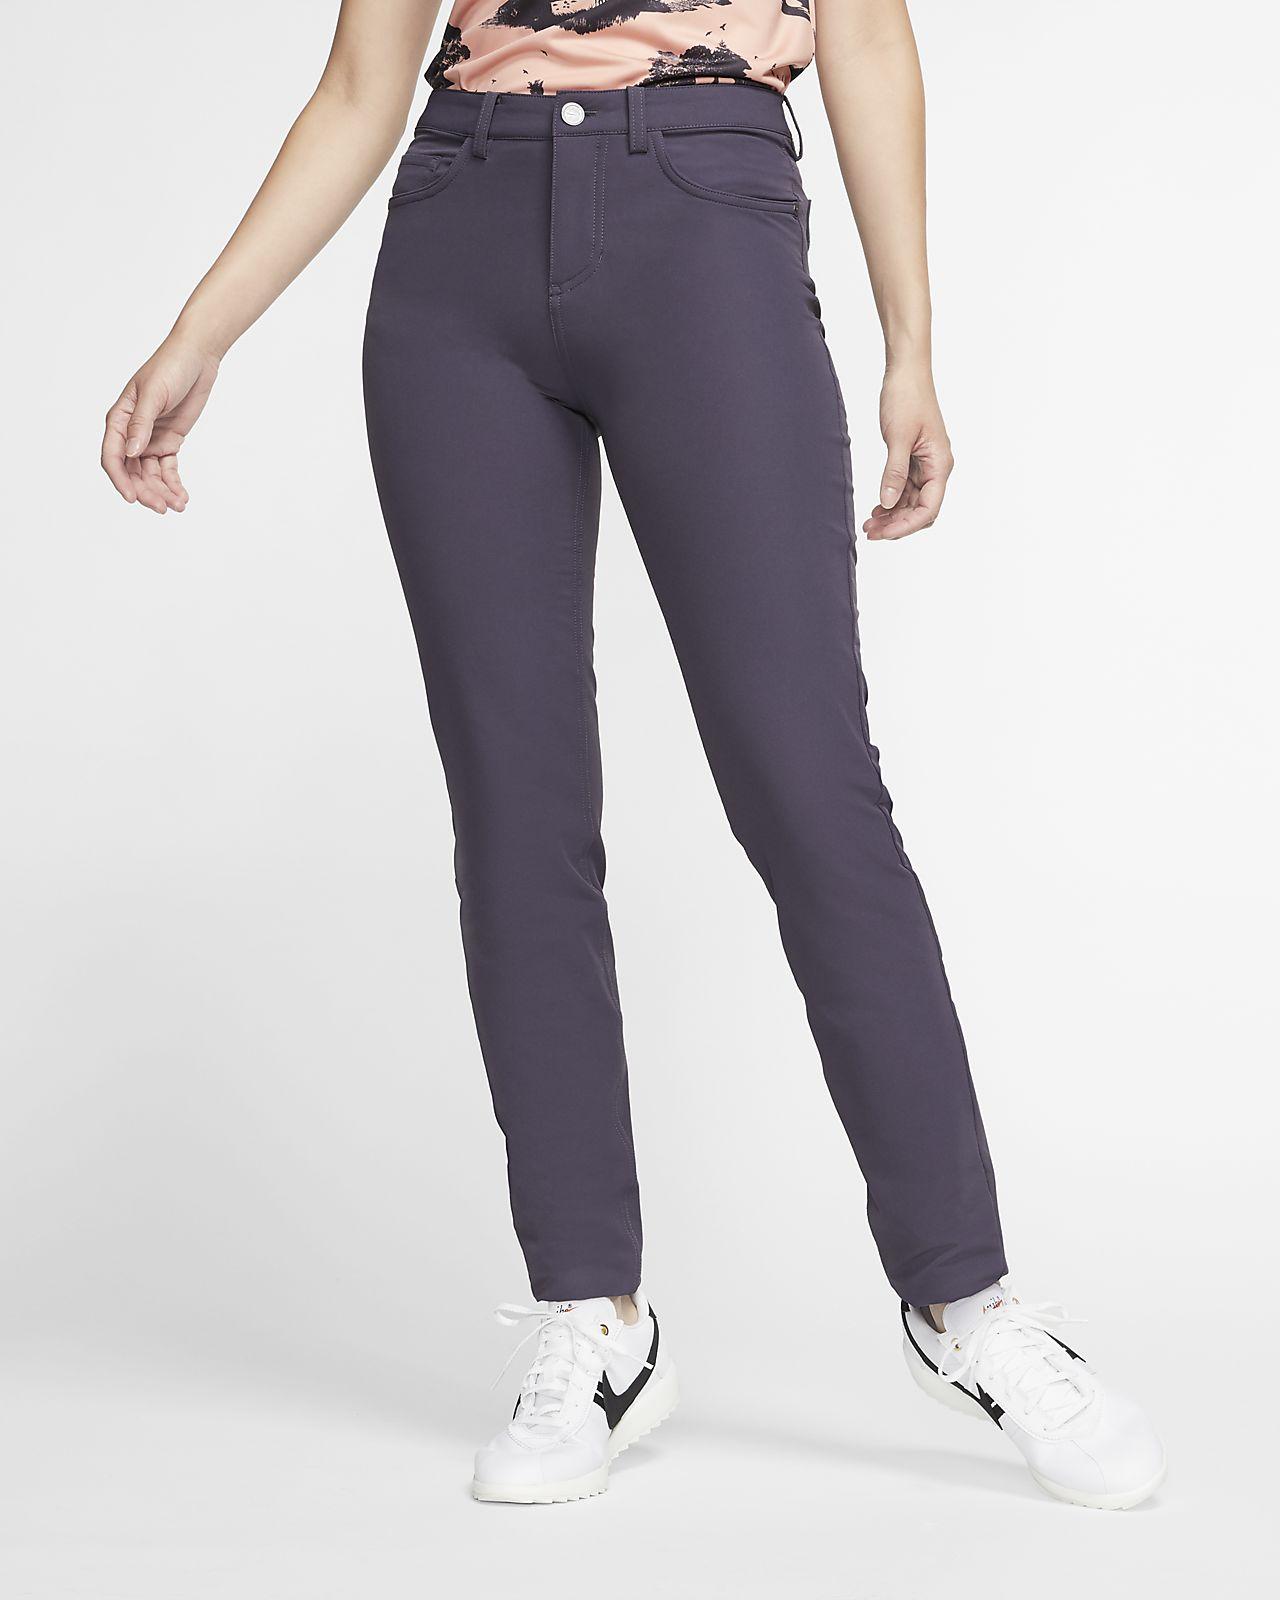 Nike Repel Women's Golf Trousers